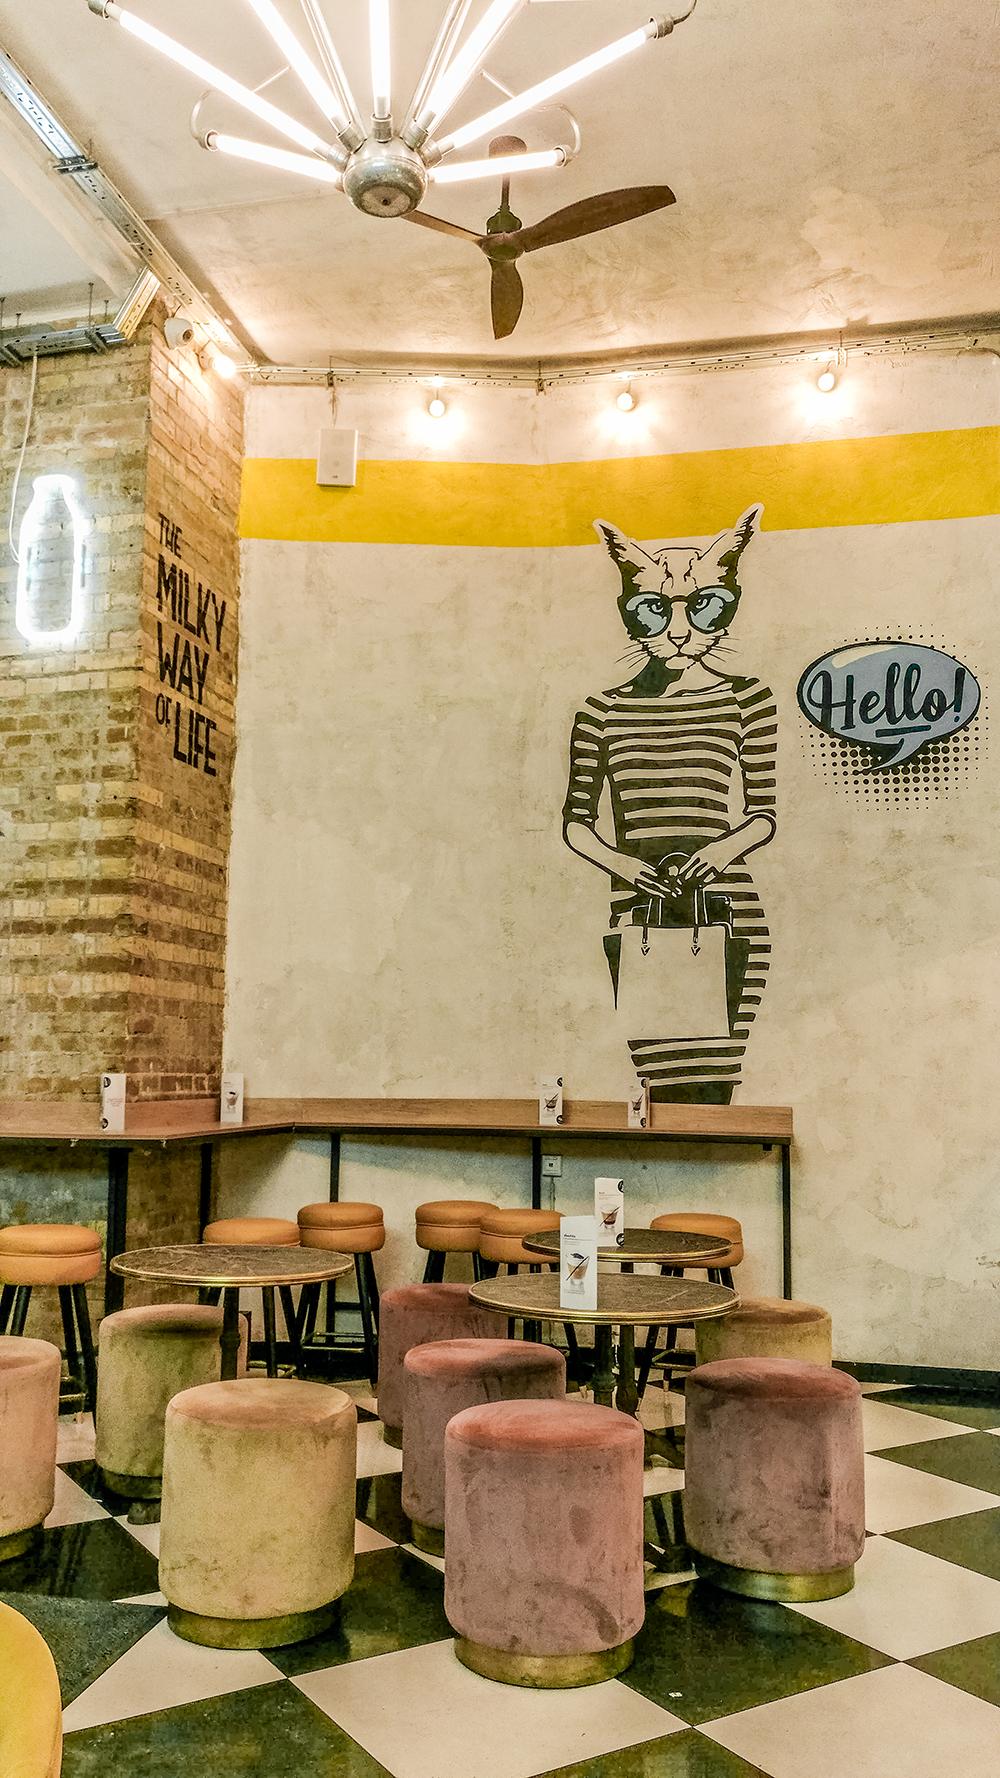 Cserpes Tejivó (Cserpes Milk Bar) - Budapest's best breakfast & brunch places in the centre - Deák Ferenc square and Astoria | Aliz's Wonderland